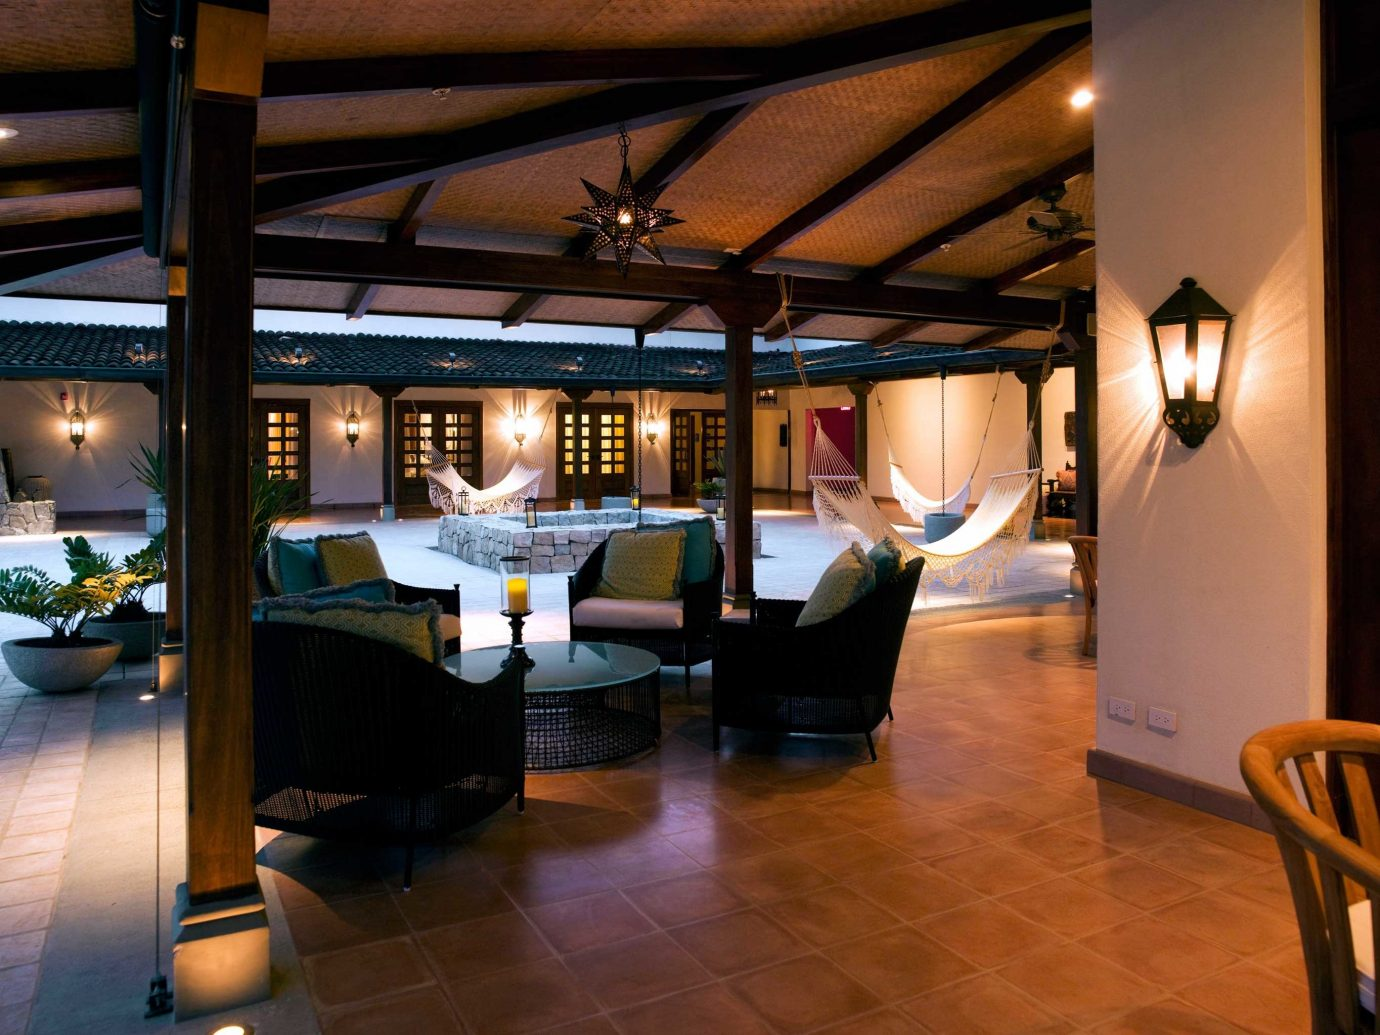 Lobby at JW Marriott Guanacaste in Costa Rica